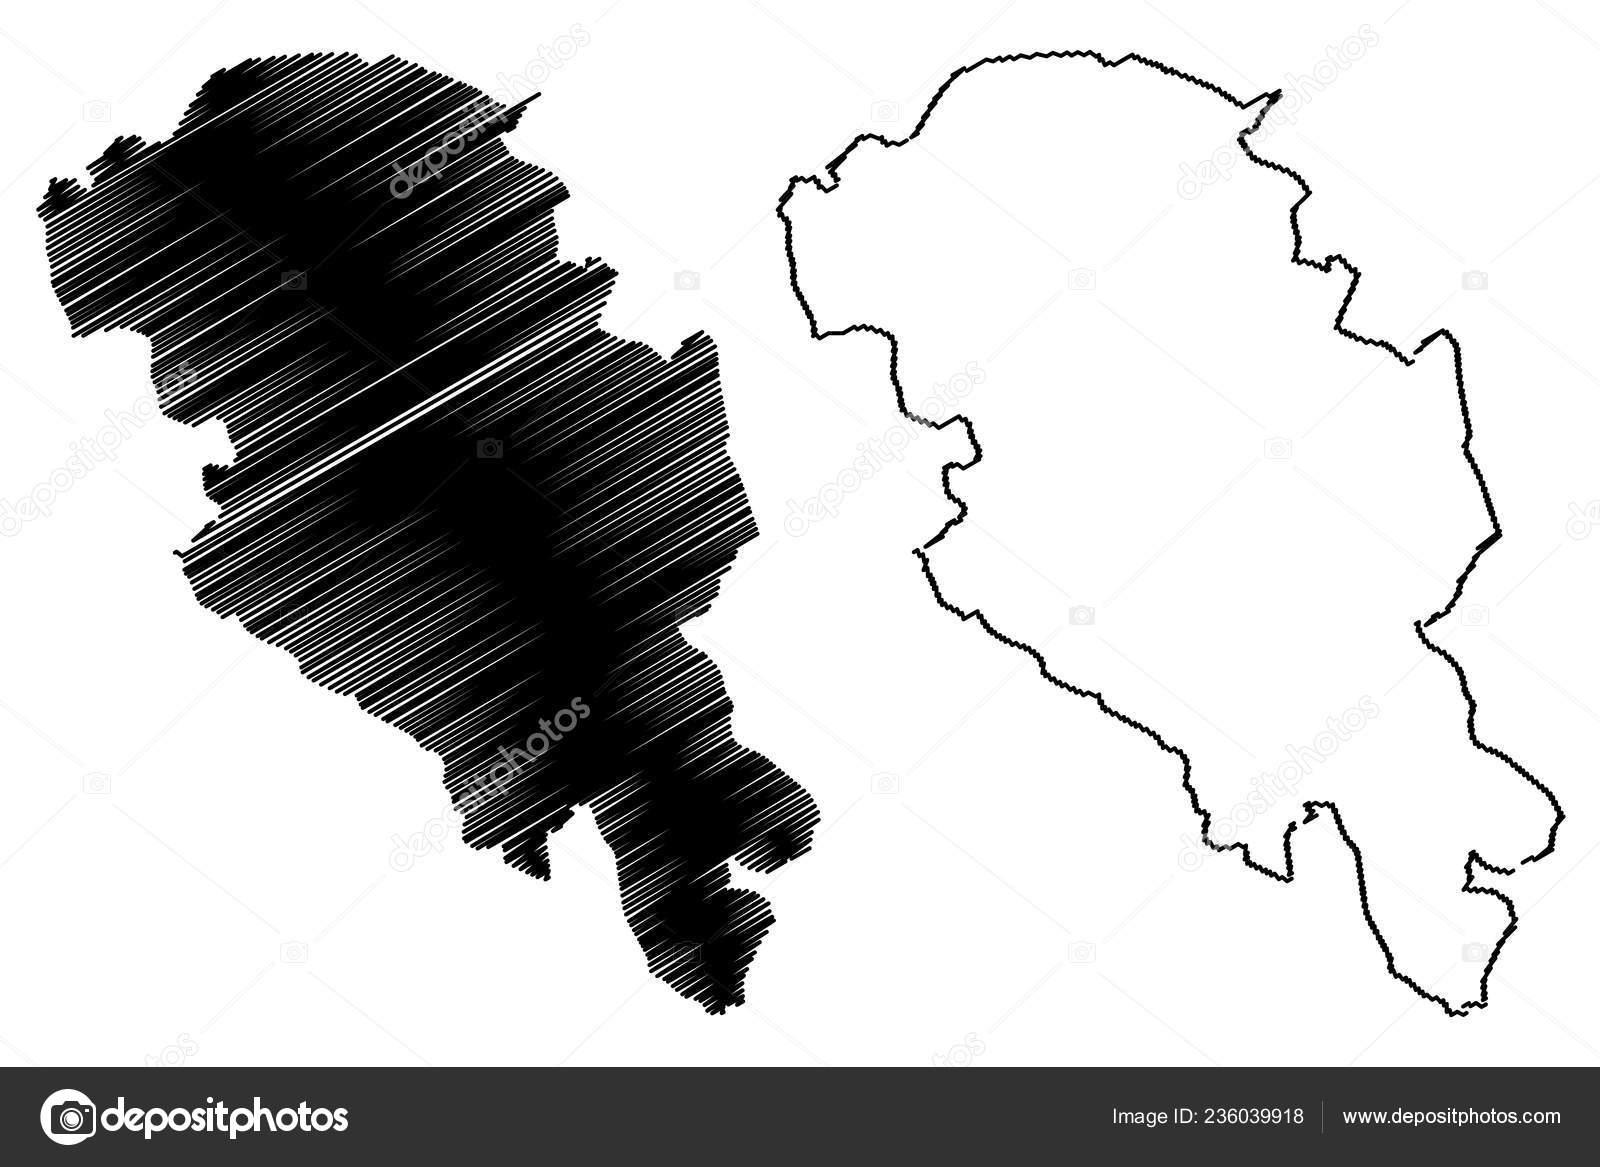 Kingdom Of Norway Map on republic of panama map, republic of maldives map, russian federation map, united arab emirates map, republic of moldova map, republic of turkey map, republic of san marino map, republic of india map, bailiwick of jersey map, republic of cyprus map, state of israel map, republic of colombia map, republic of south africa map, people's republic of china map, united states of america map, united republic of tanzania map, republic of belarus map, republic of nauru map, japan map, republic of palau map,